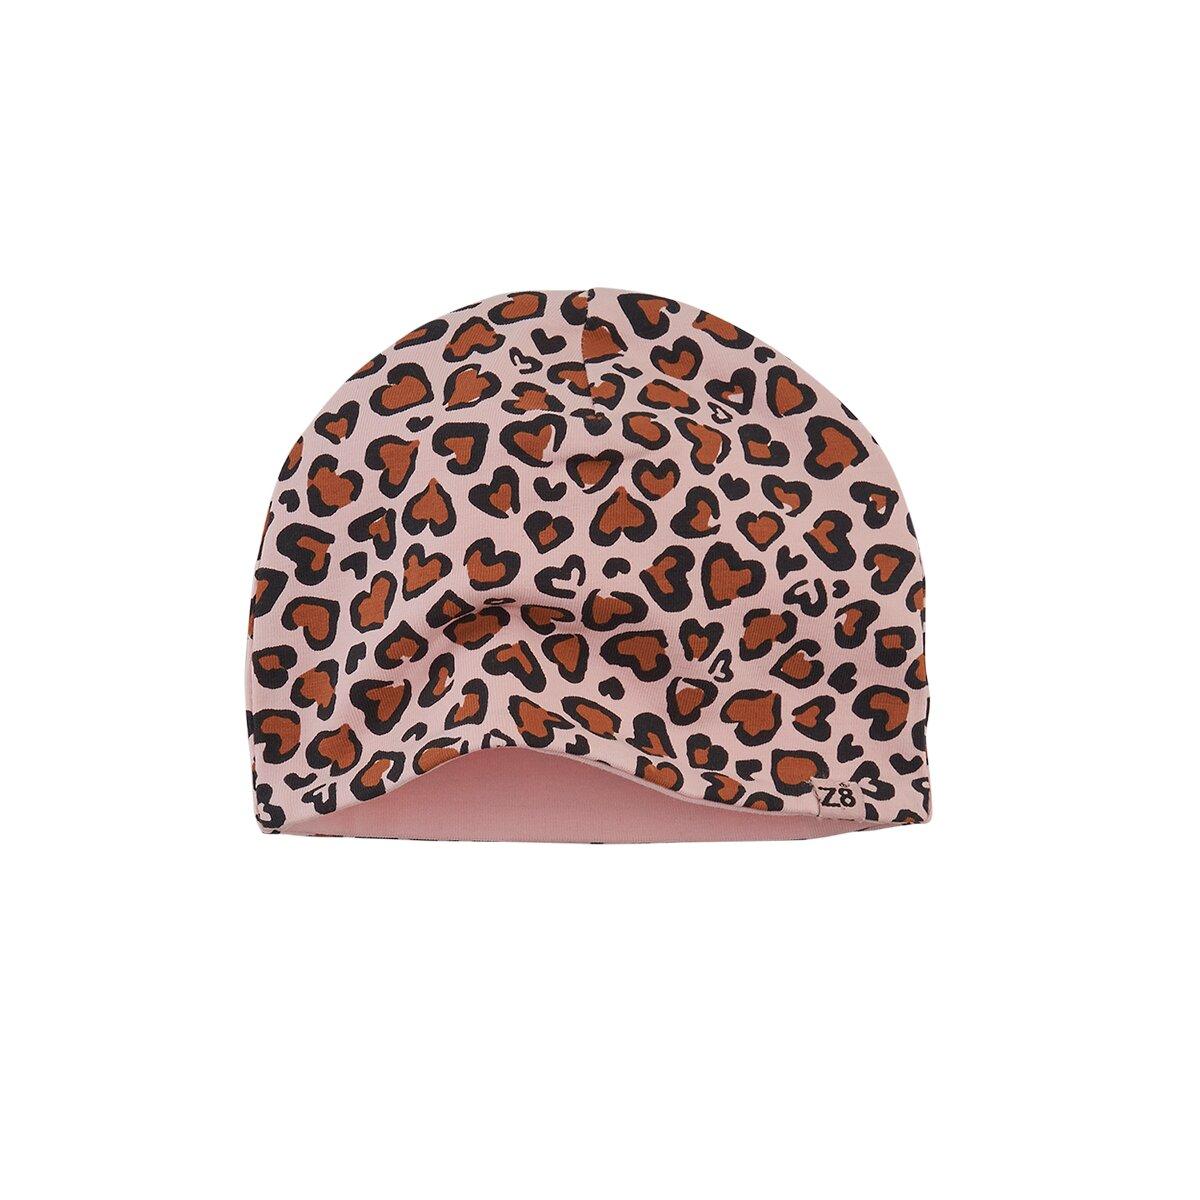 z8-newbornproducts200050valencia-leopard-pink